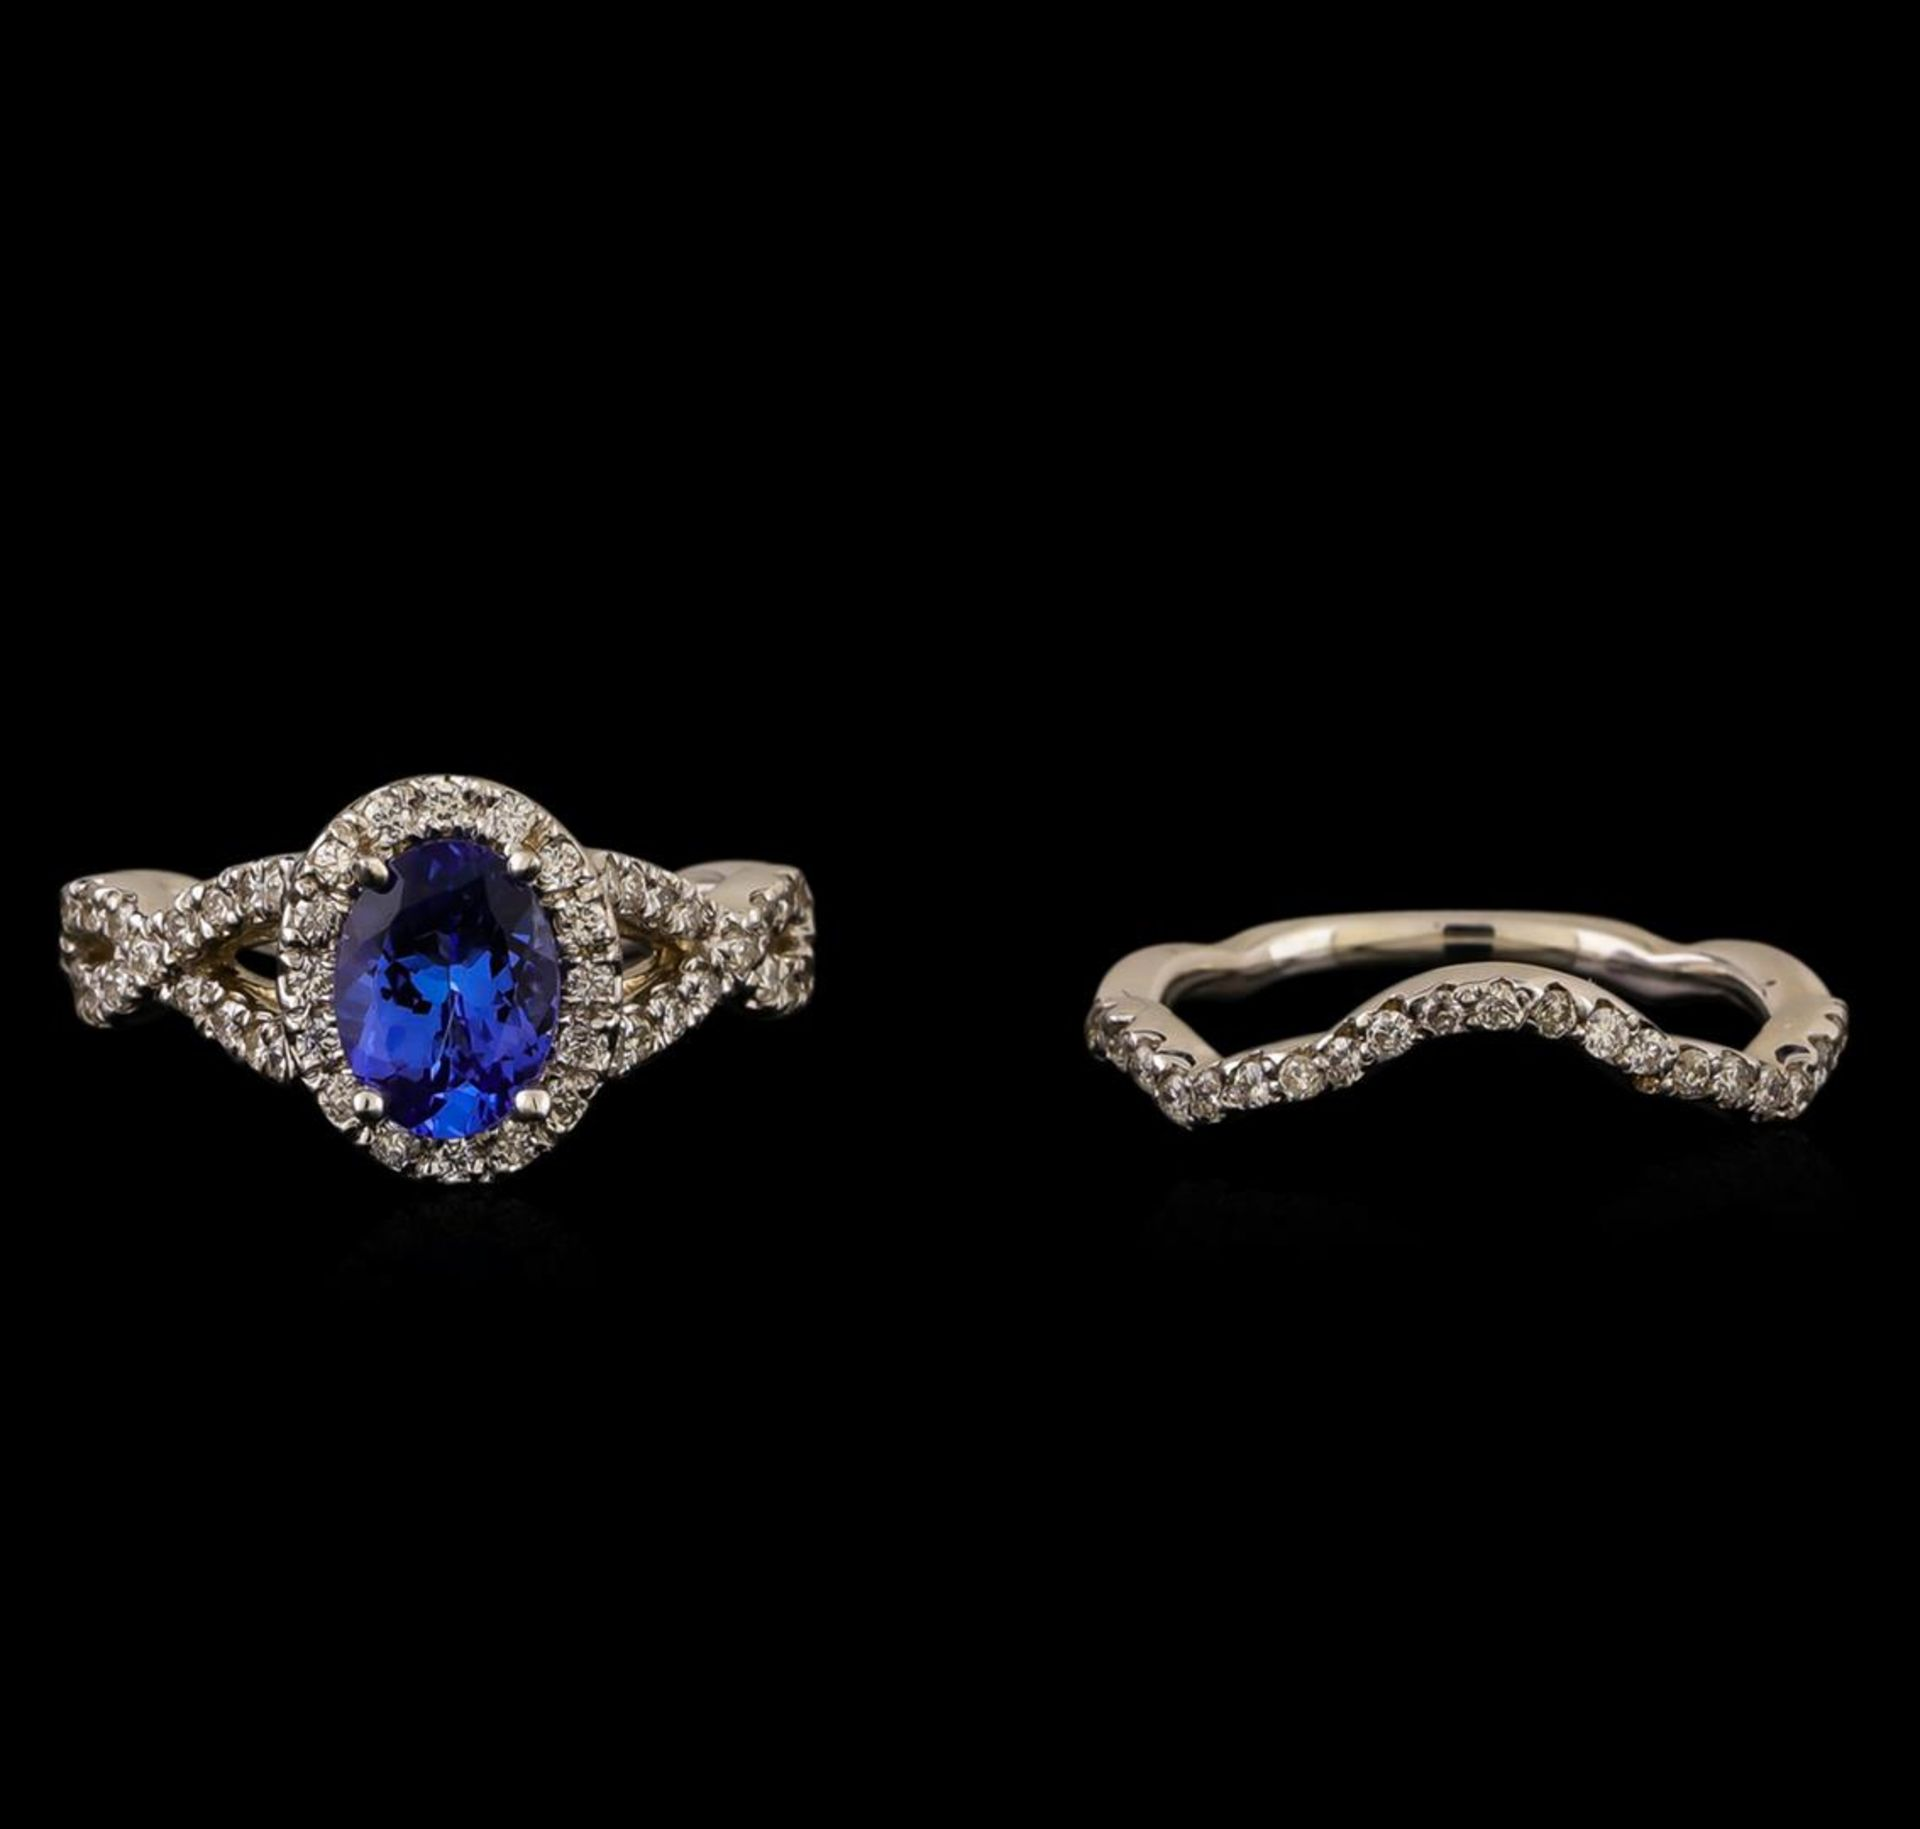 14KT White Gold 1.44 ctw Tanzanite and Diamond Ring - Image 2 of 4